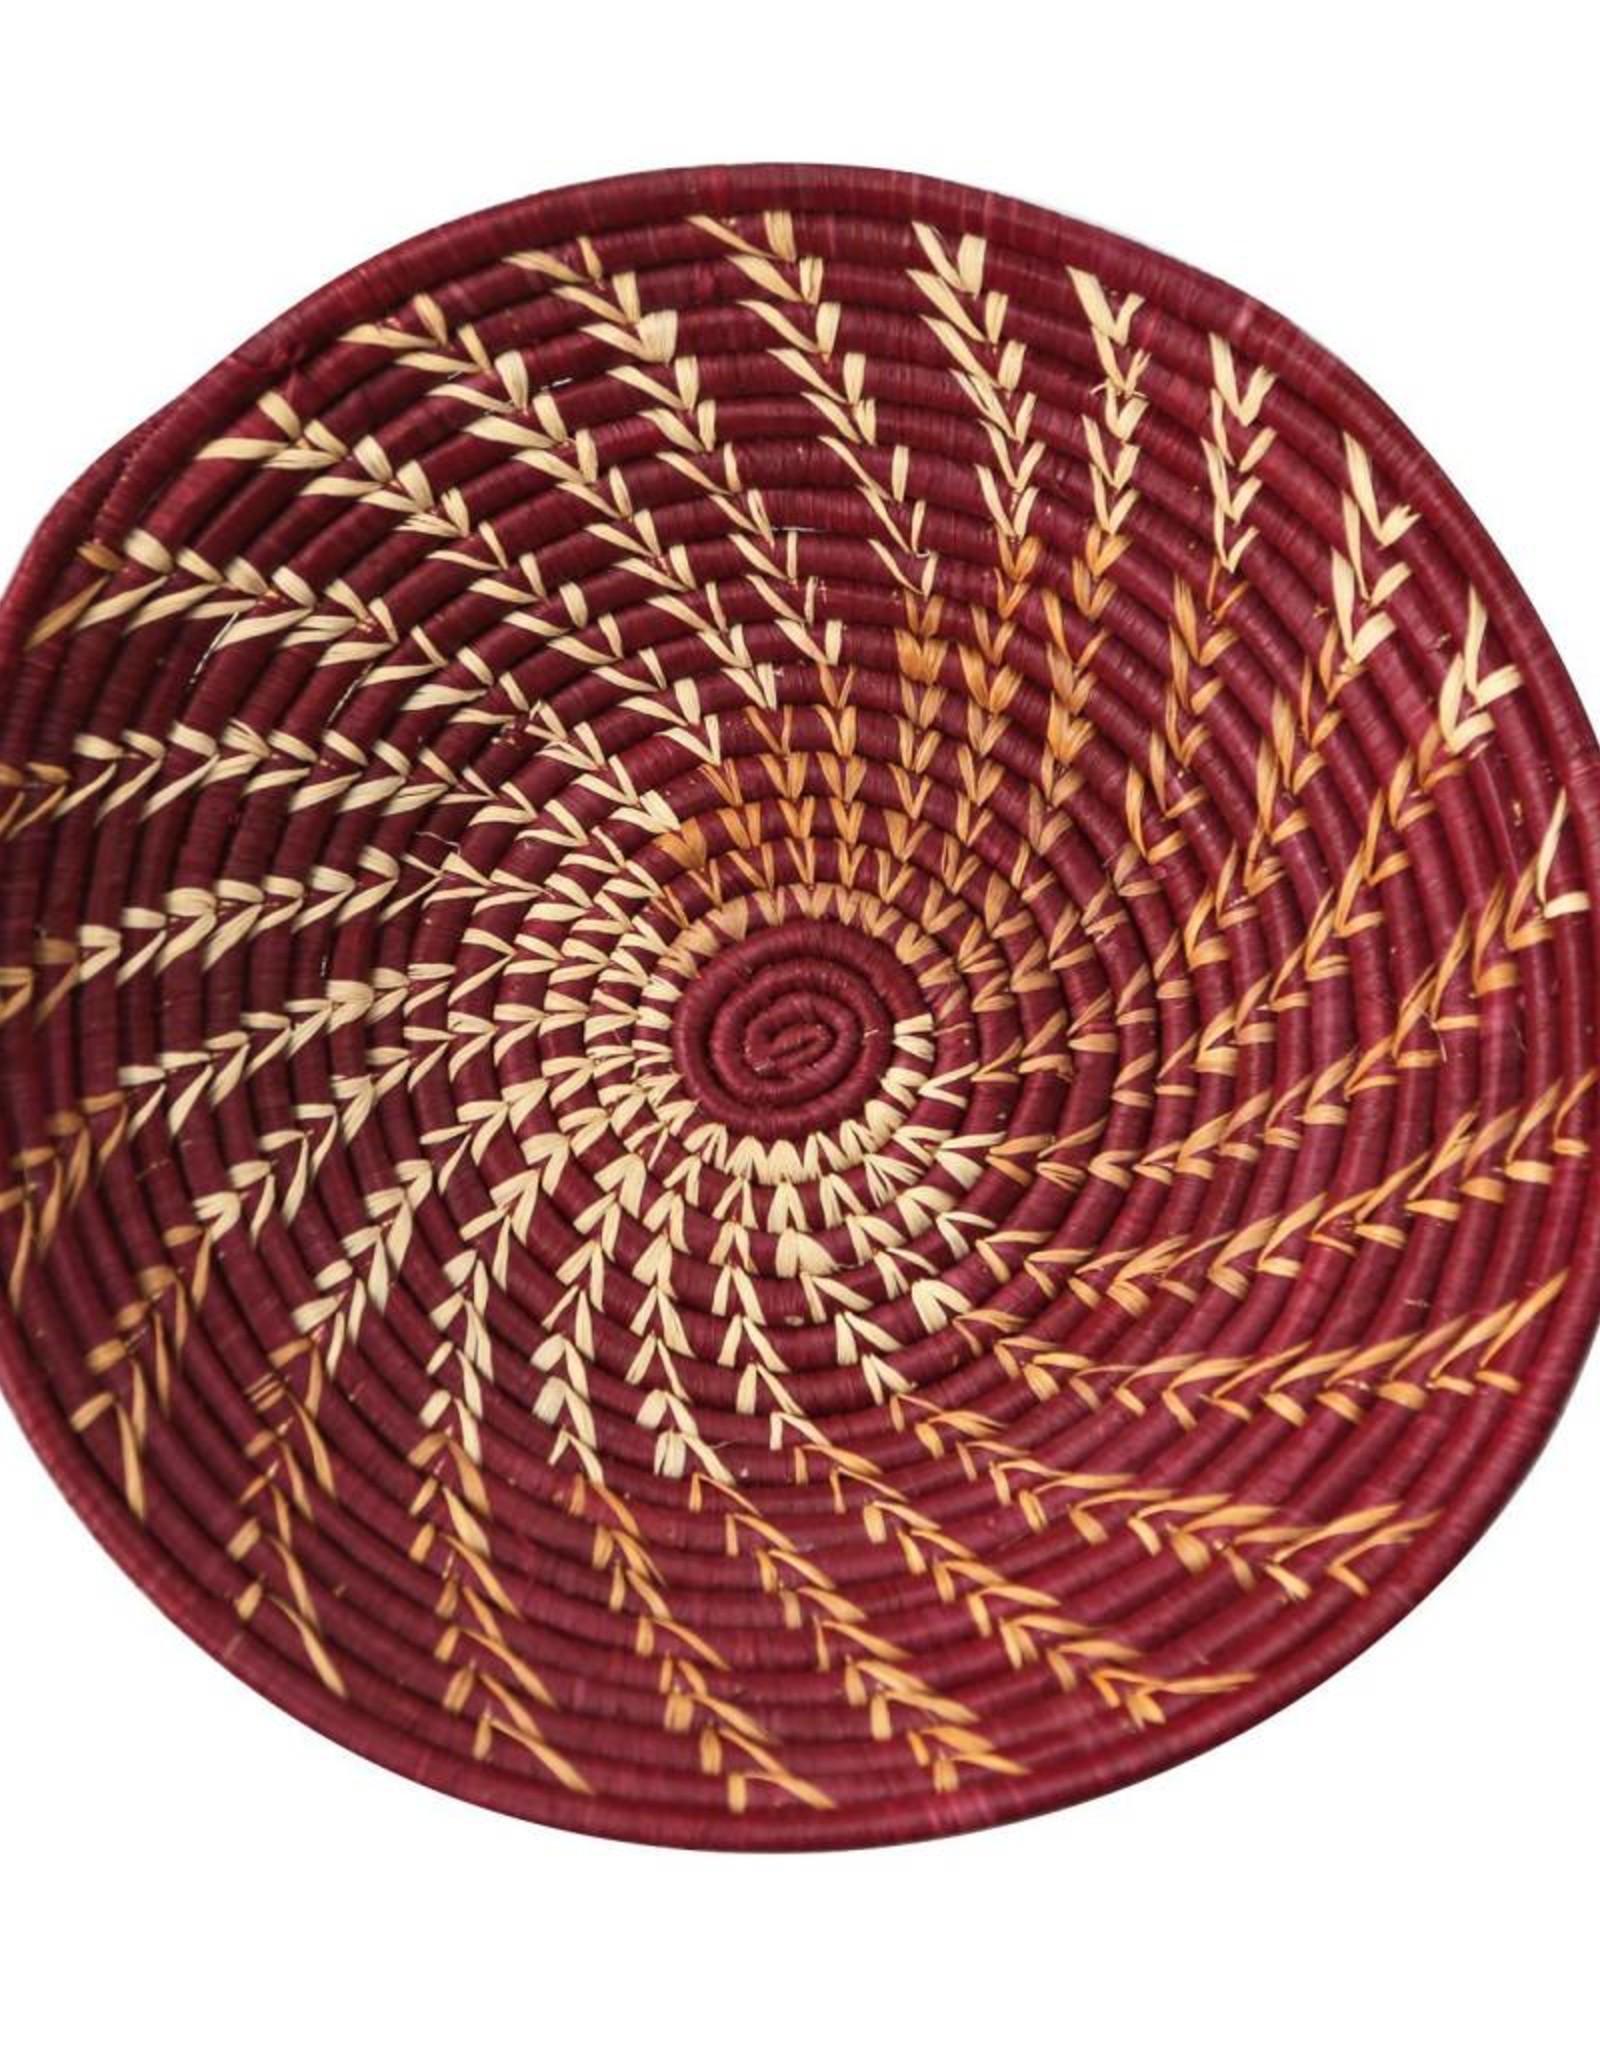 Raffia Spiral Baskets - 4 Colors!